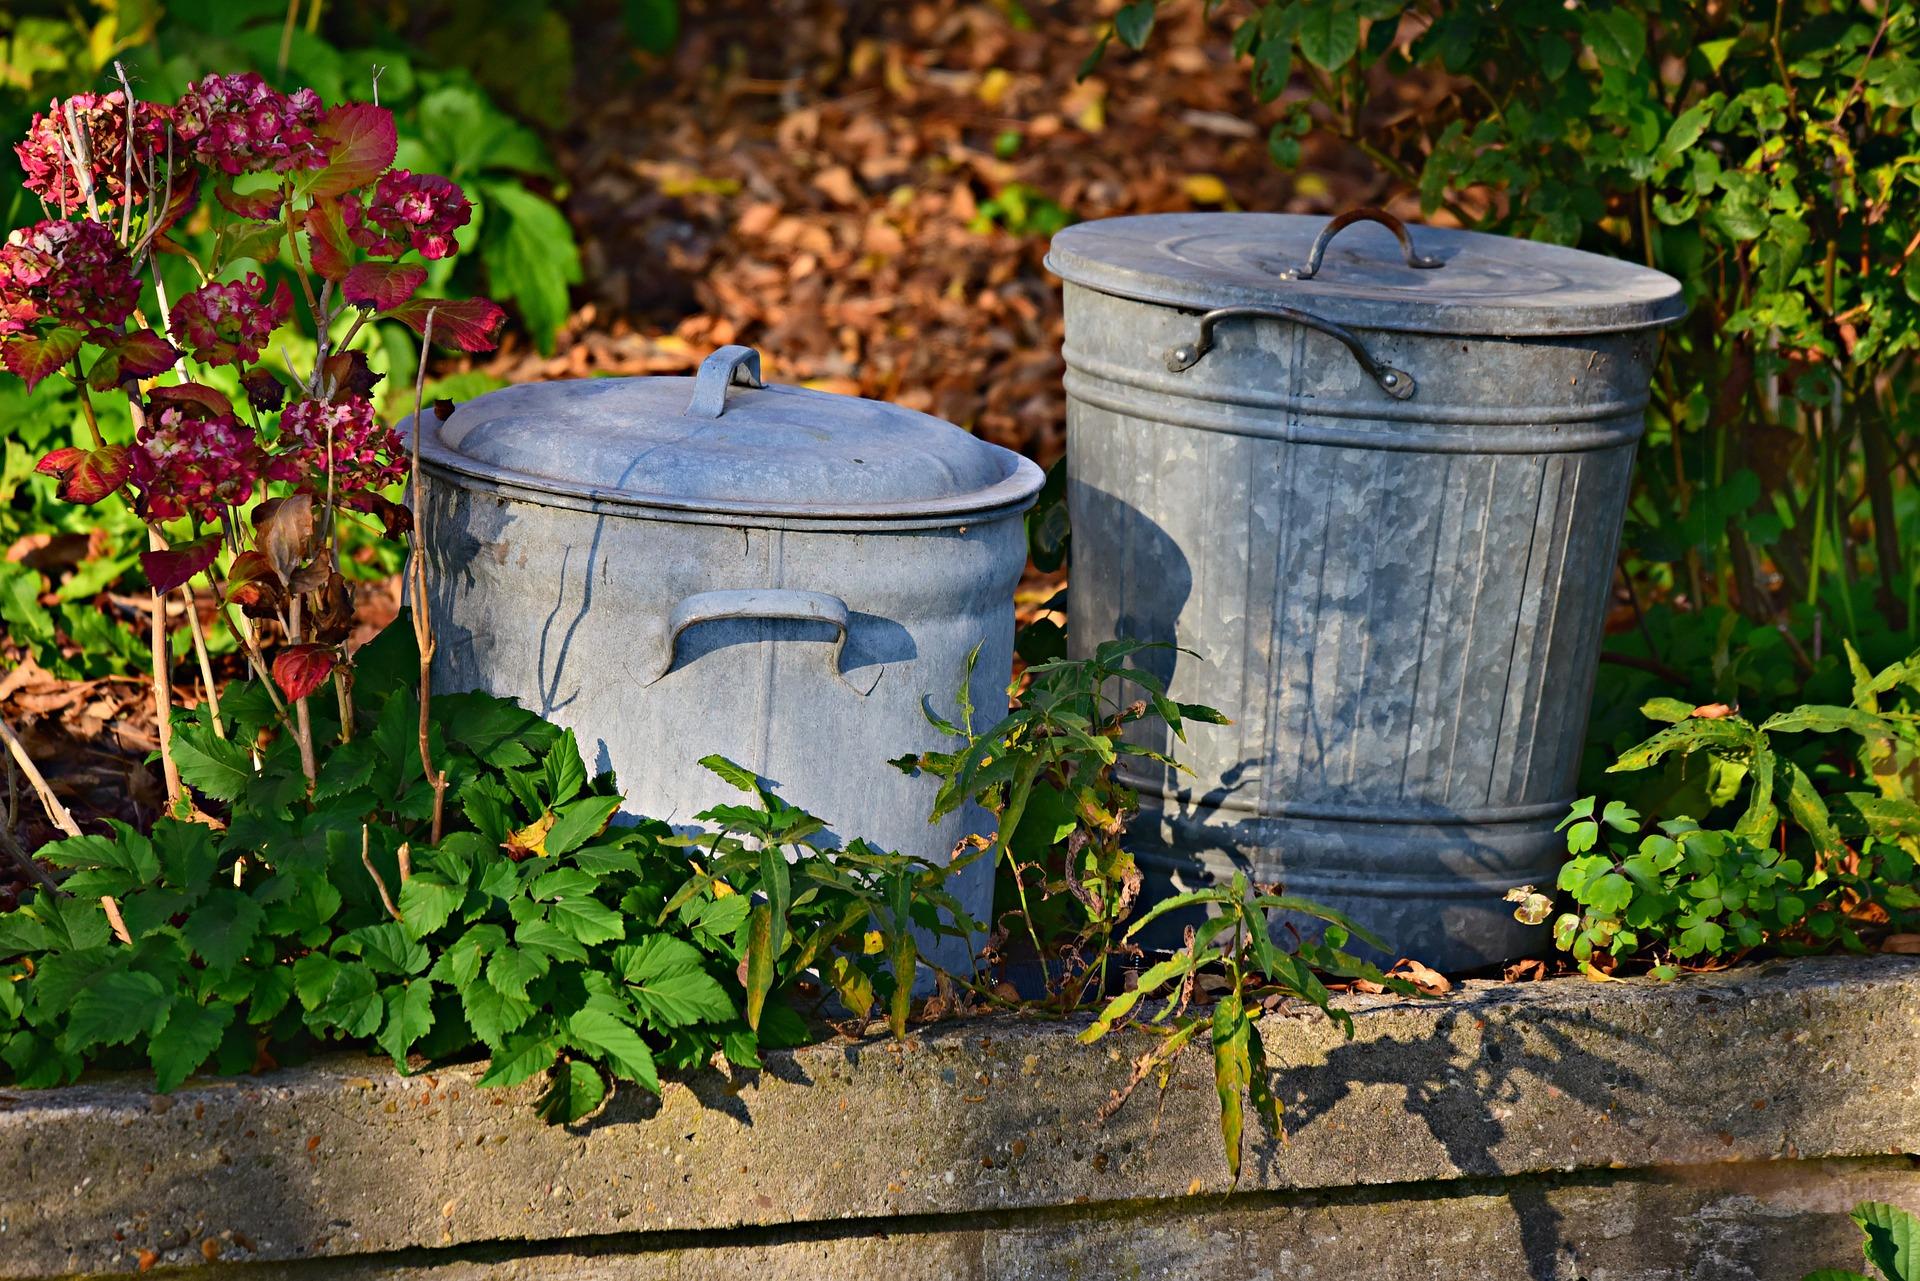 lixo residuo reciclagem sustentabilidade